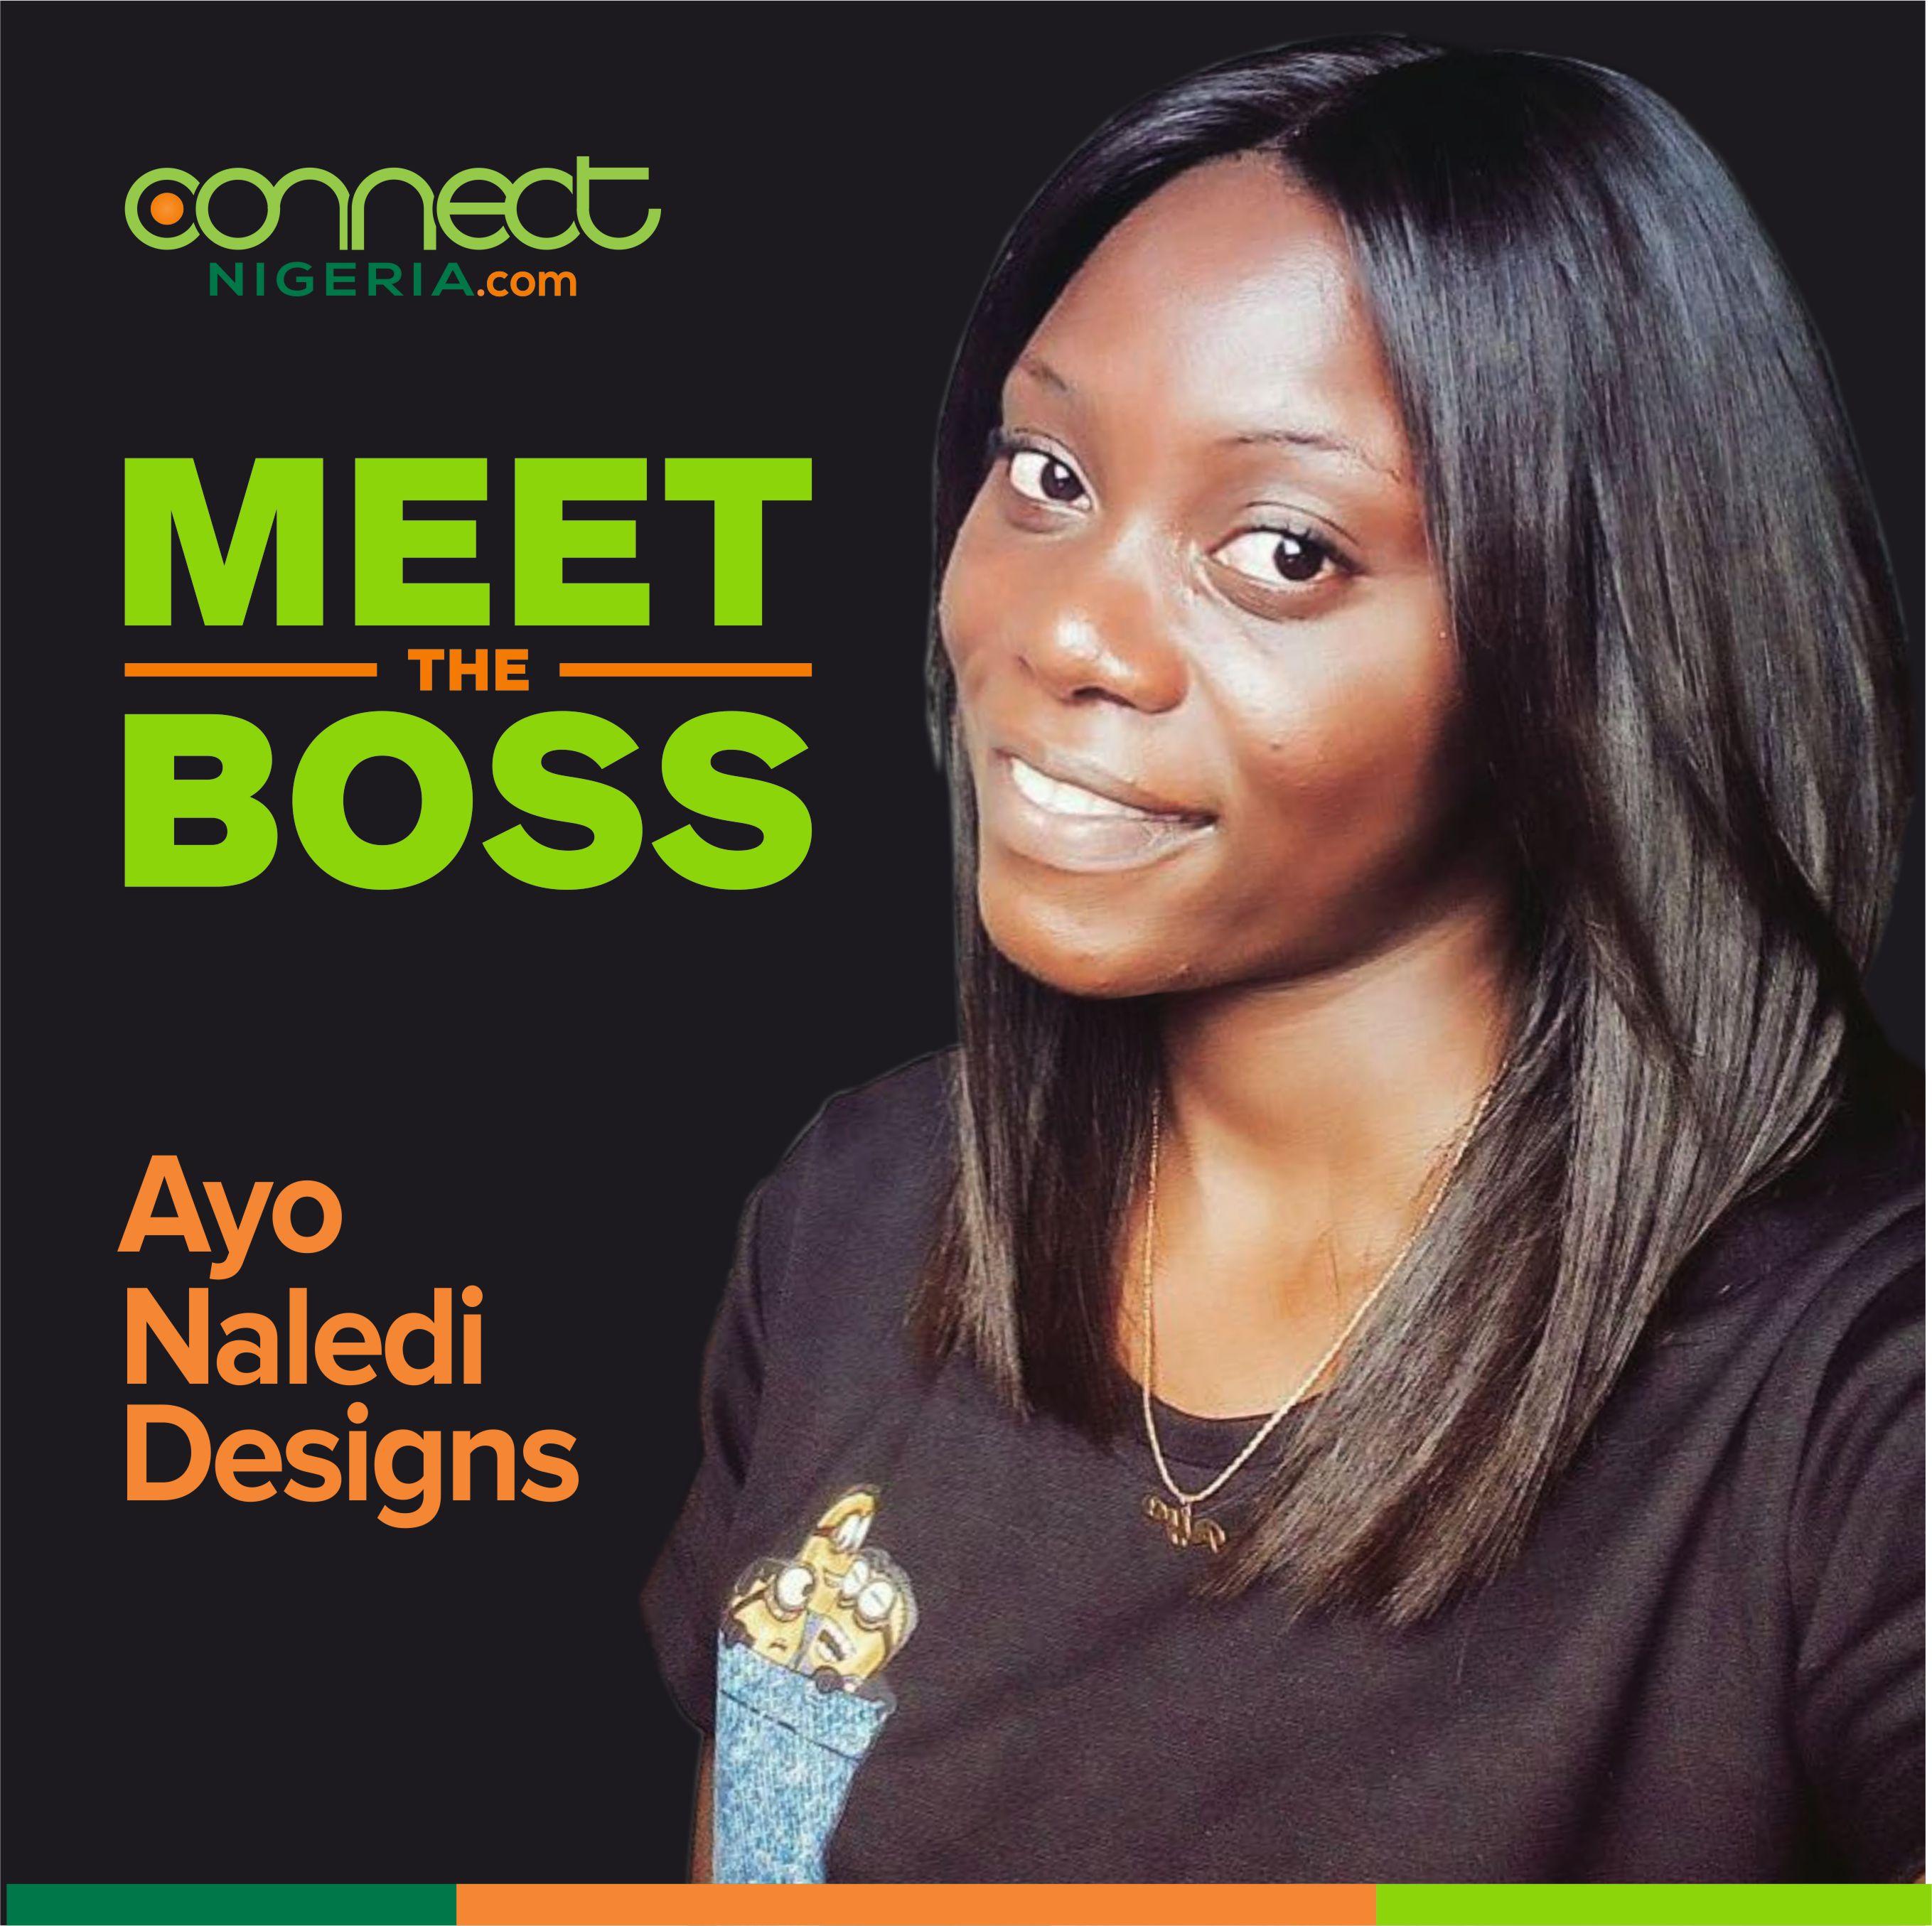 Ayo Naledi Designs